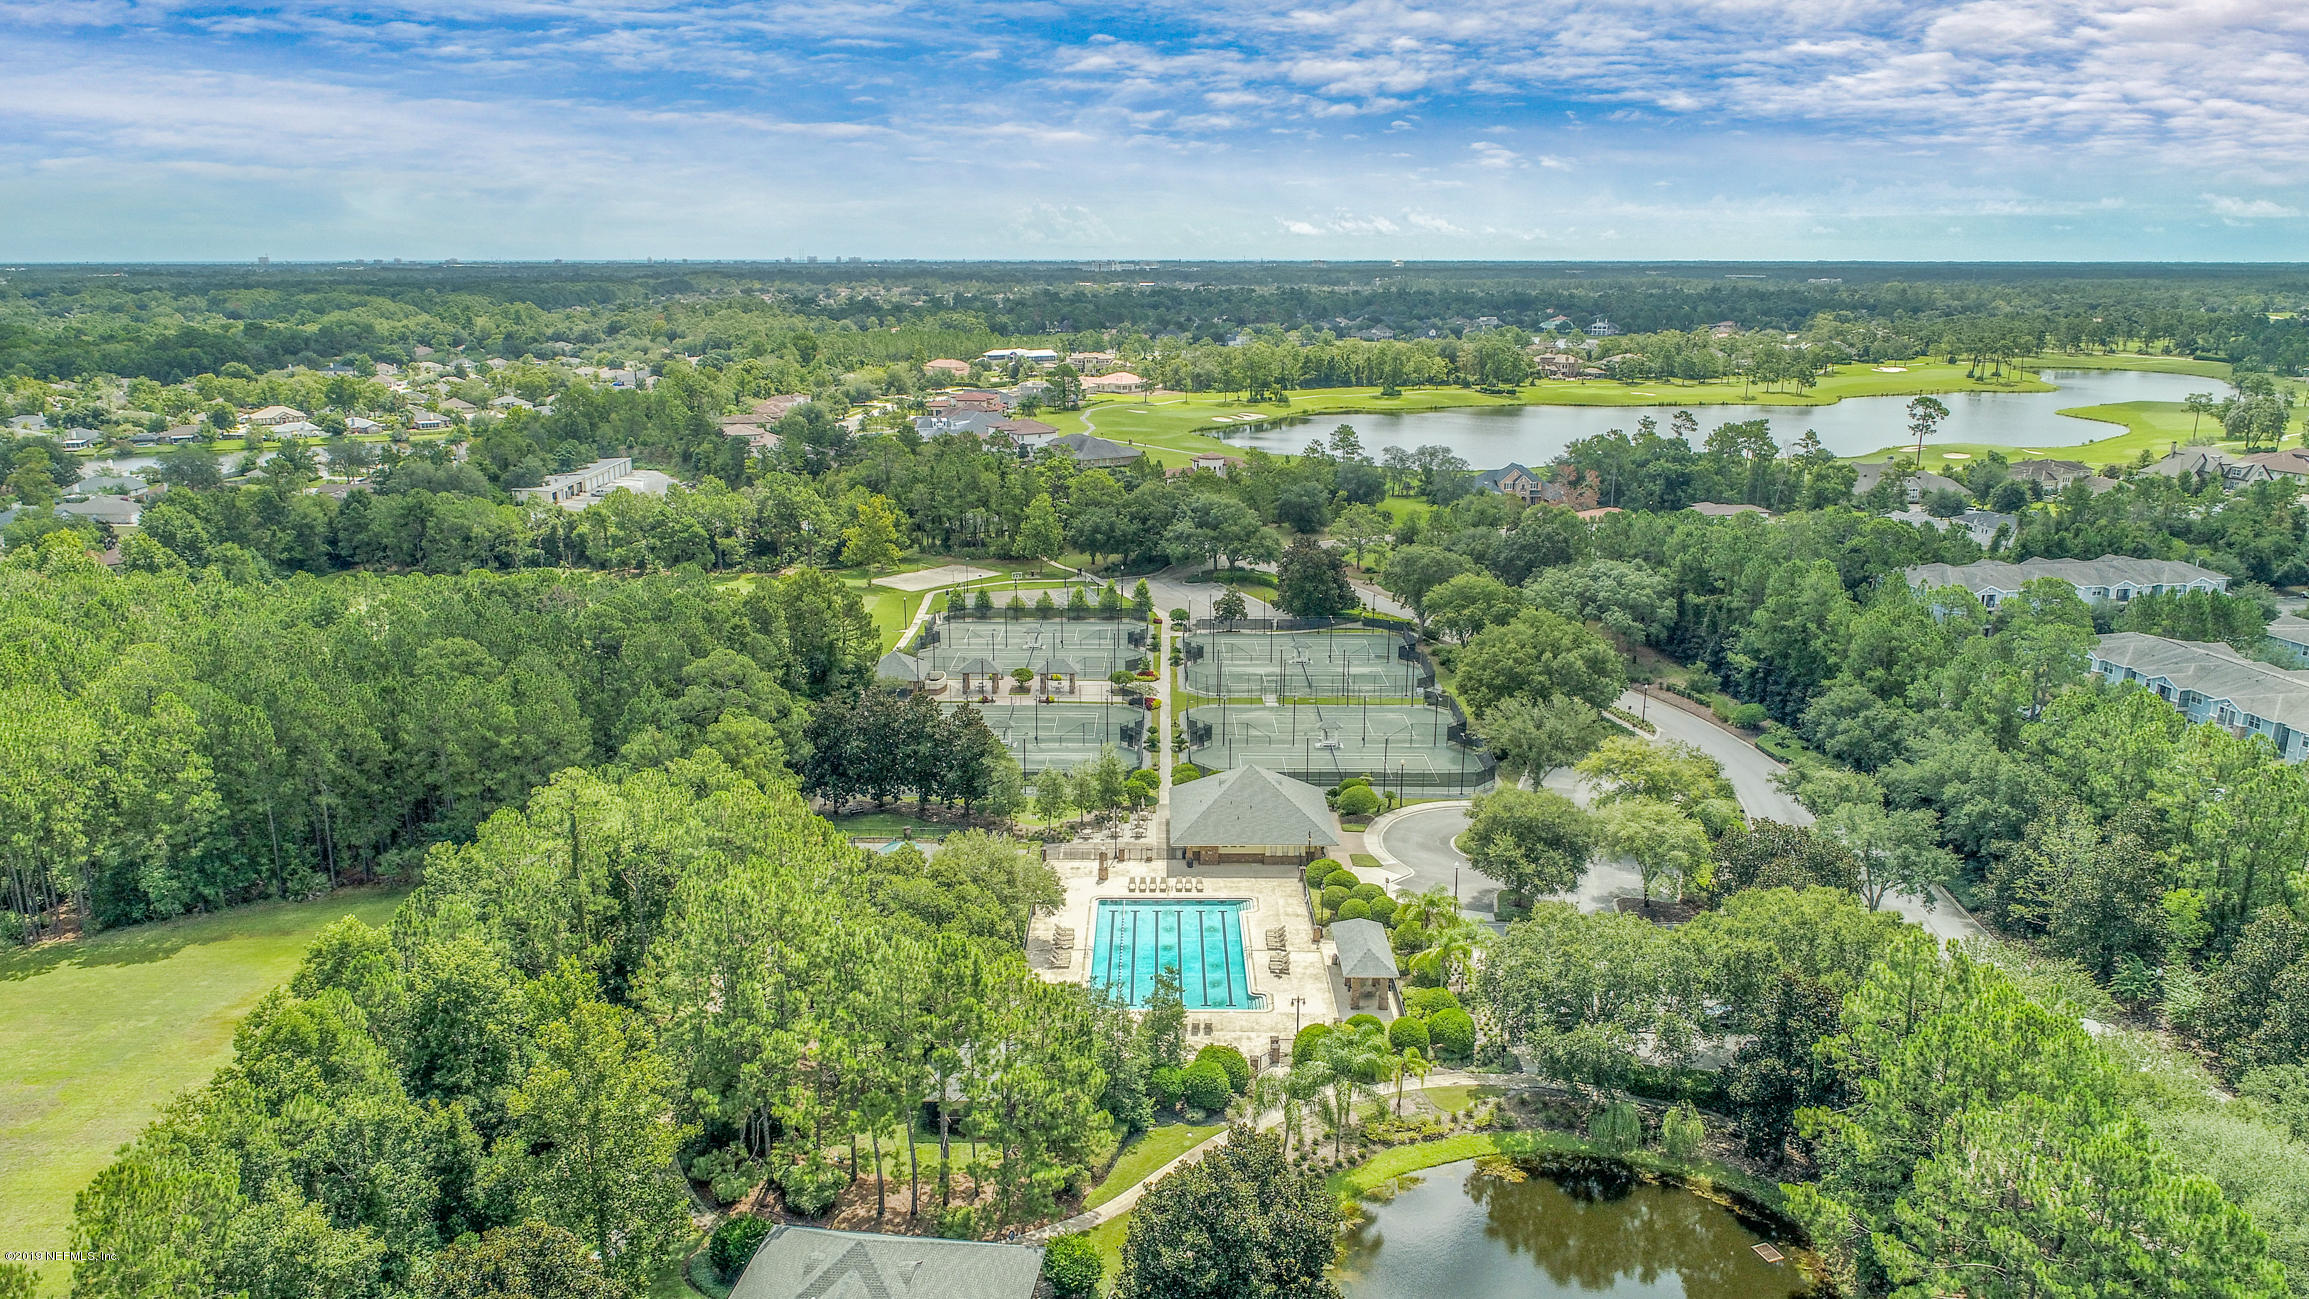 12322 GLEN KERNAN, JACKSONVILLE, FLORIDA 32224, ,Vacant land,For sale,GLEN KERNAN,1010965